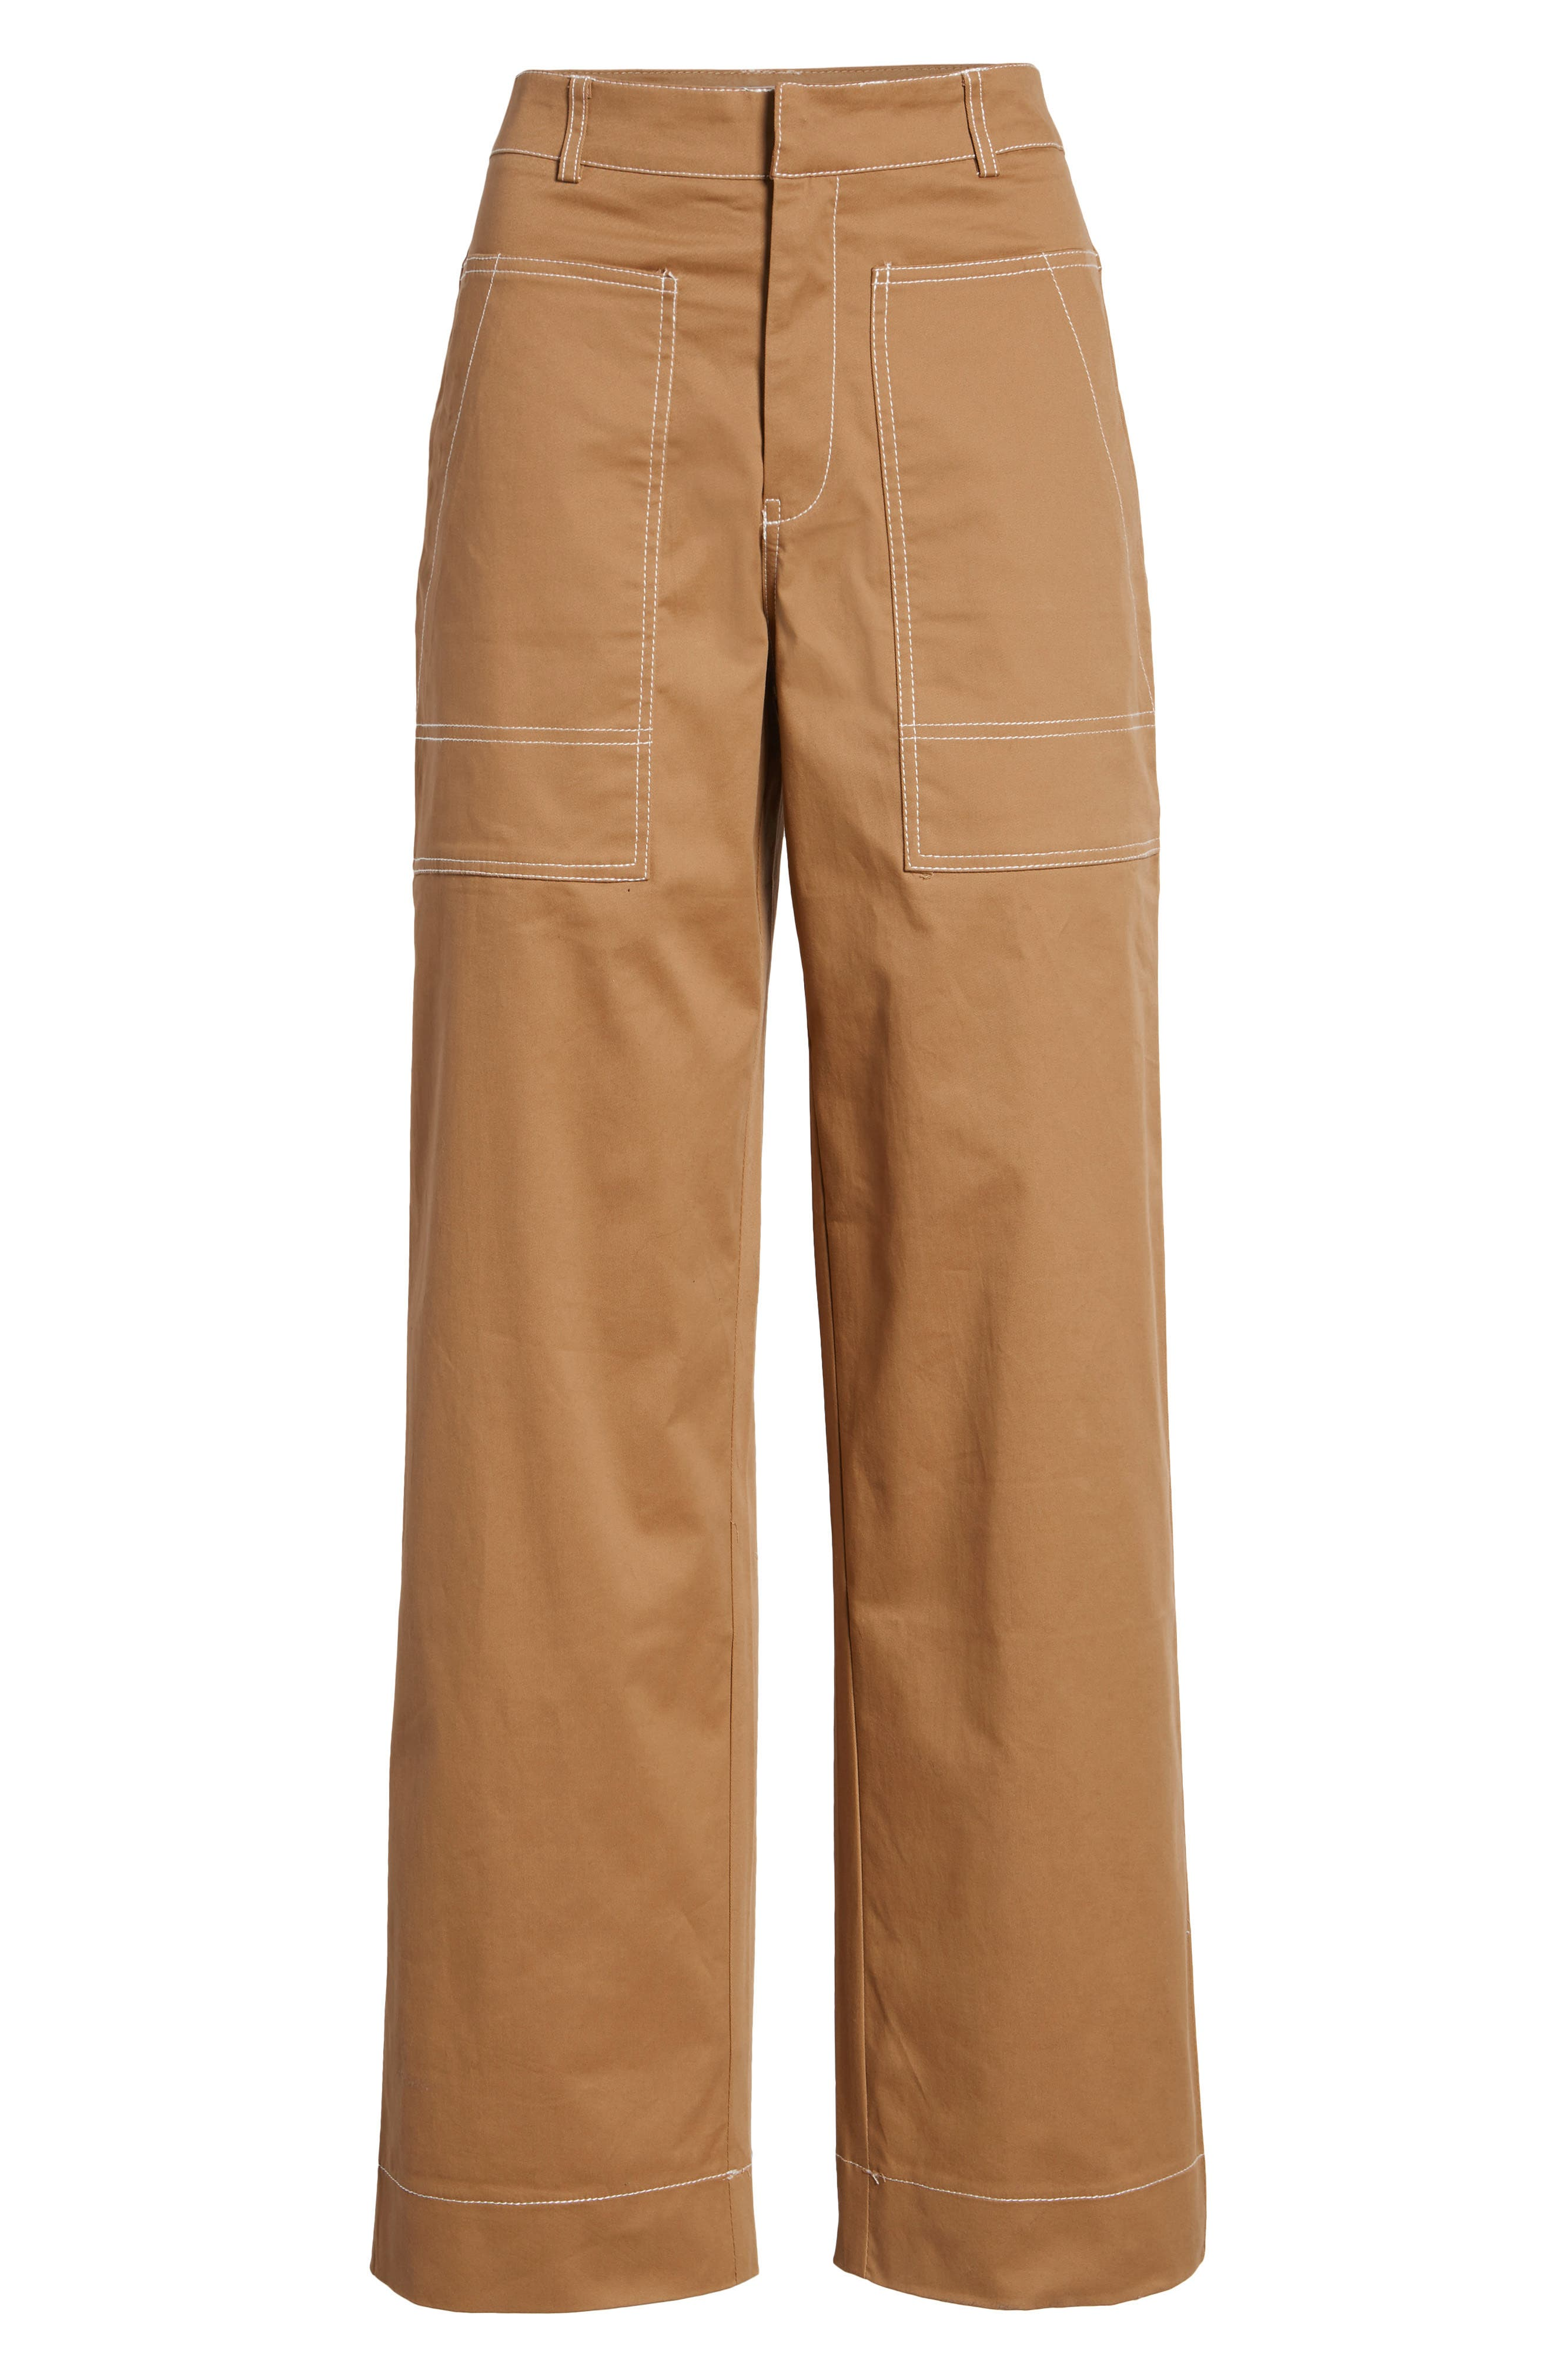 Ada Wide Leg Pants,                             Alternate thumbnail 6, color,                             250